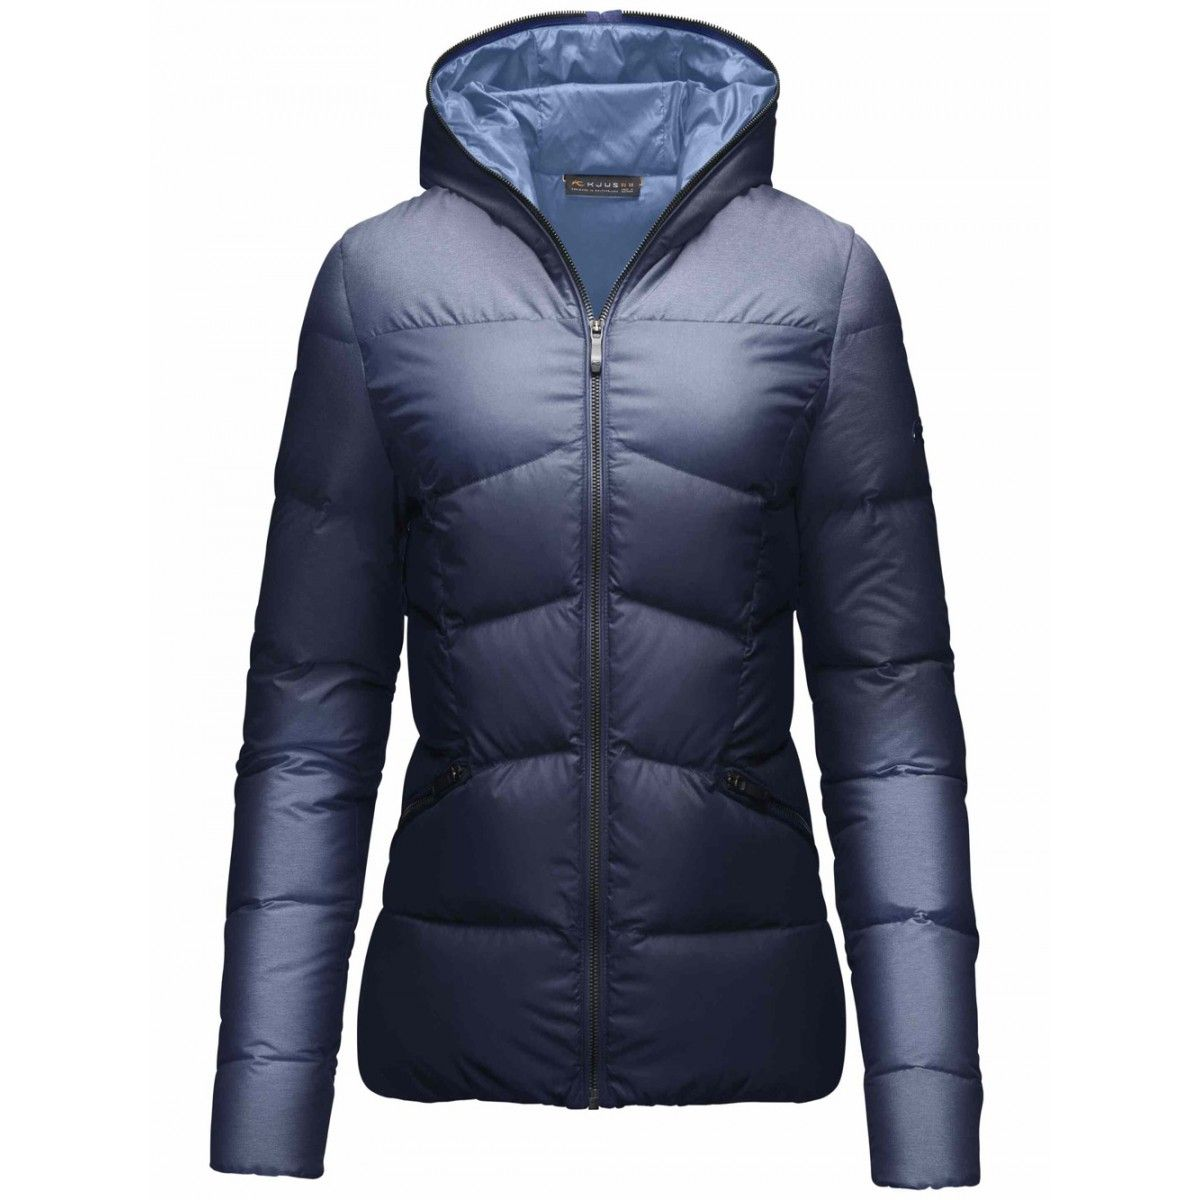 Purchase Kjus Vals Jacket For Women Atlanta Blue From Hamilton Sports Ski Jacket Women Ski Women Jackets For Women